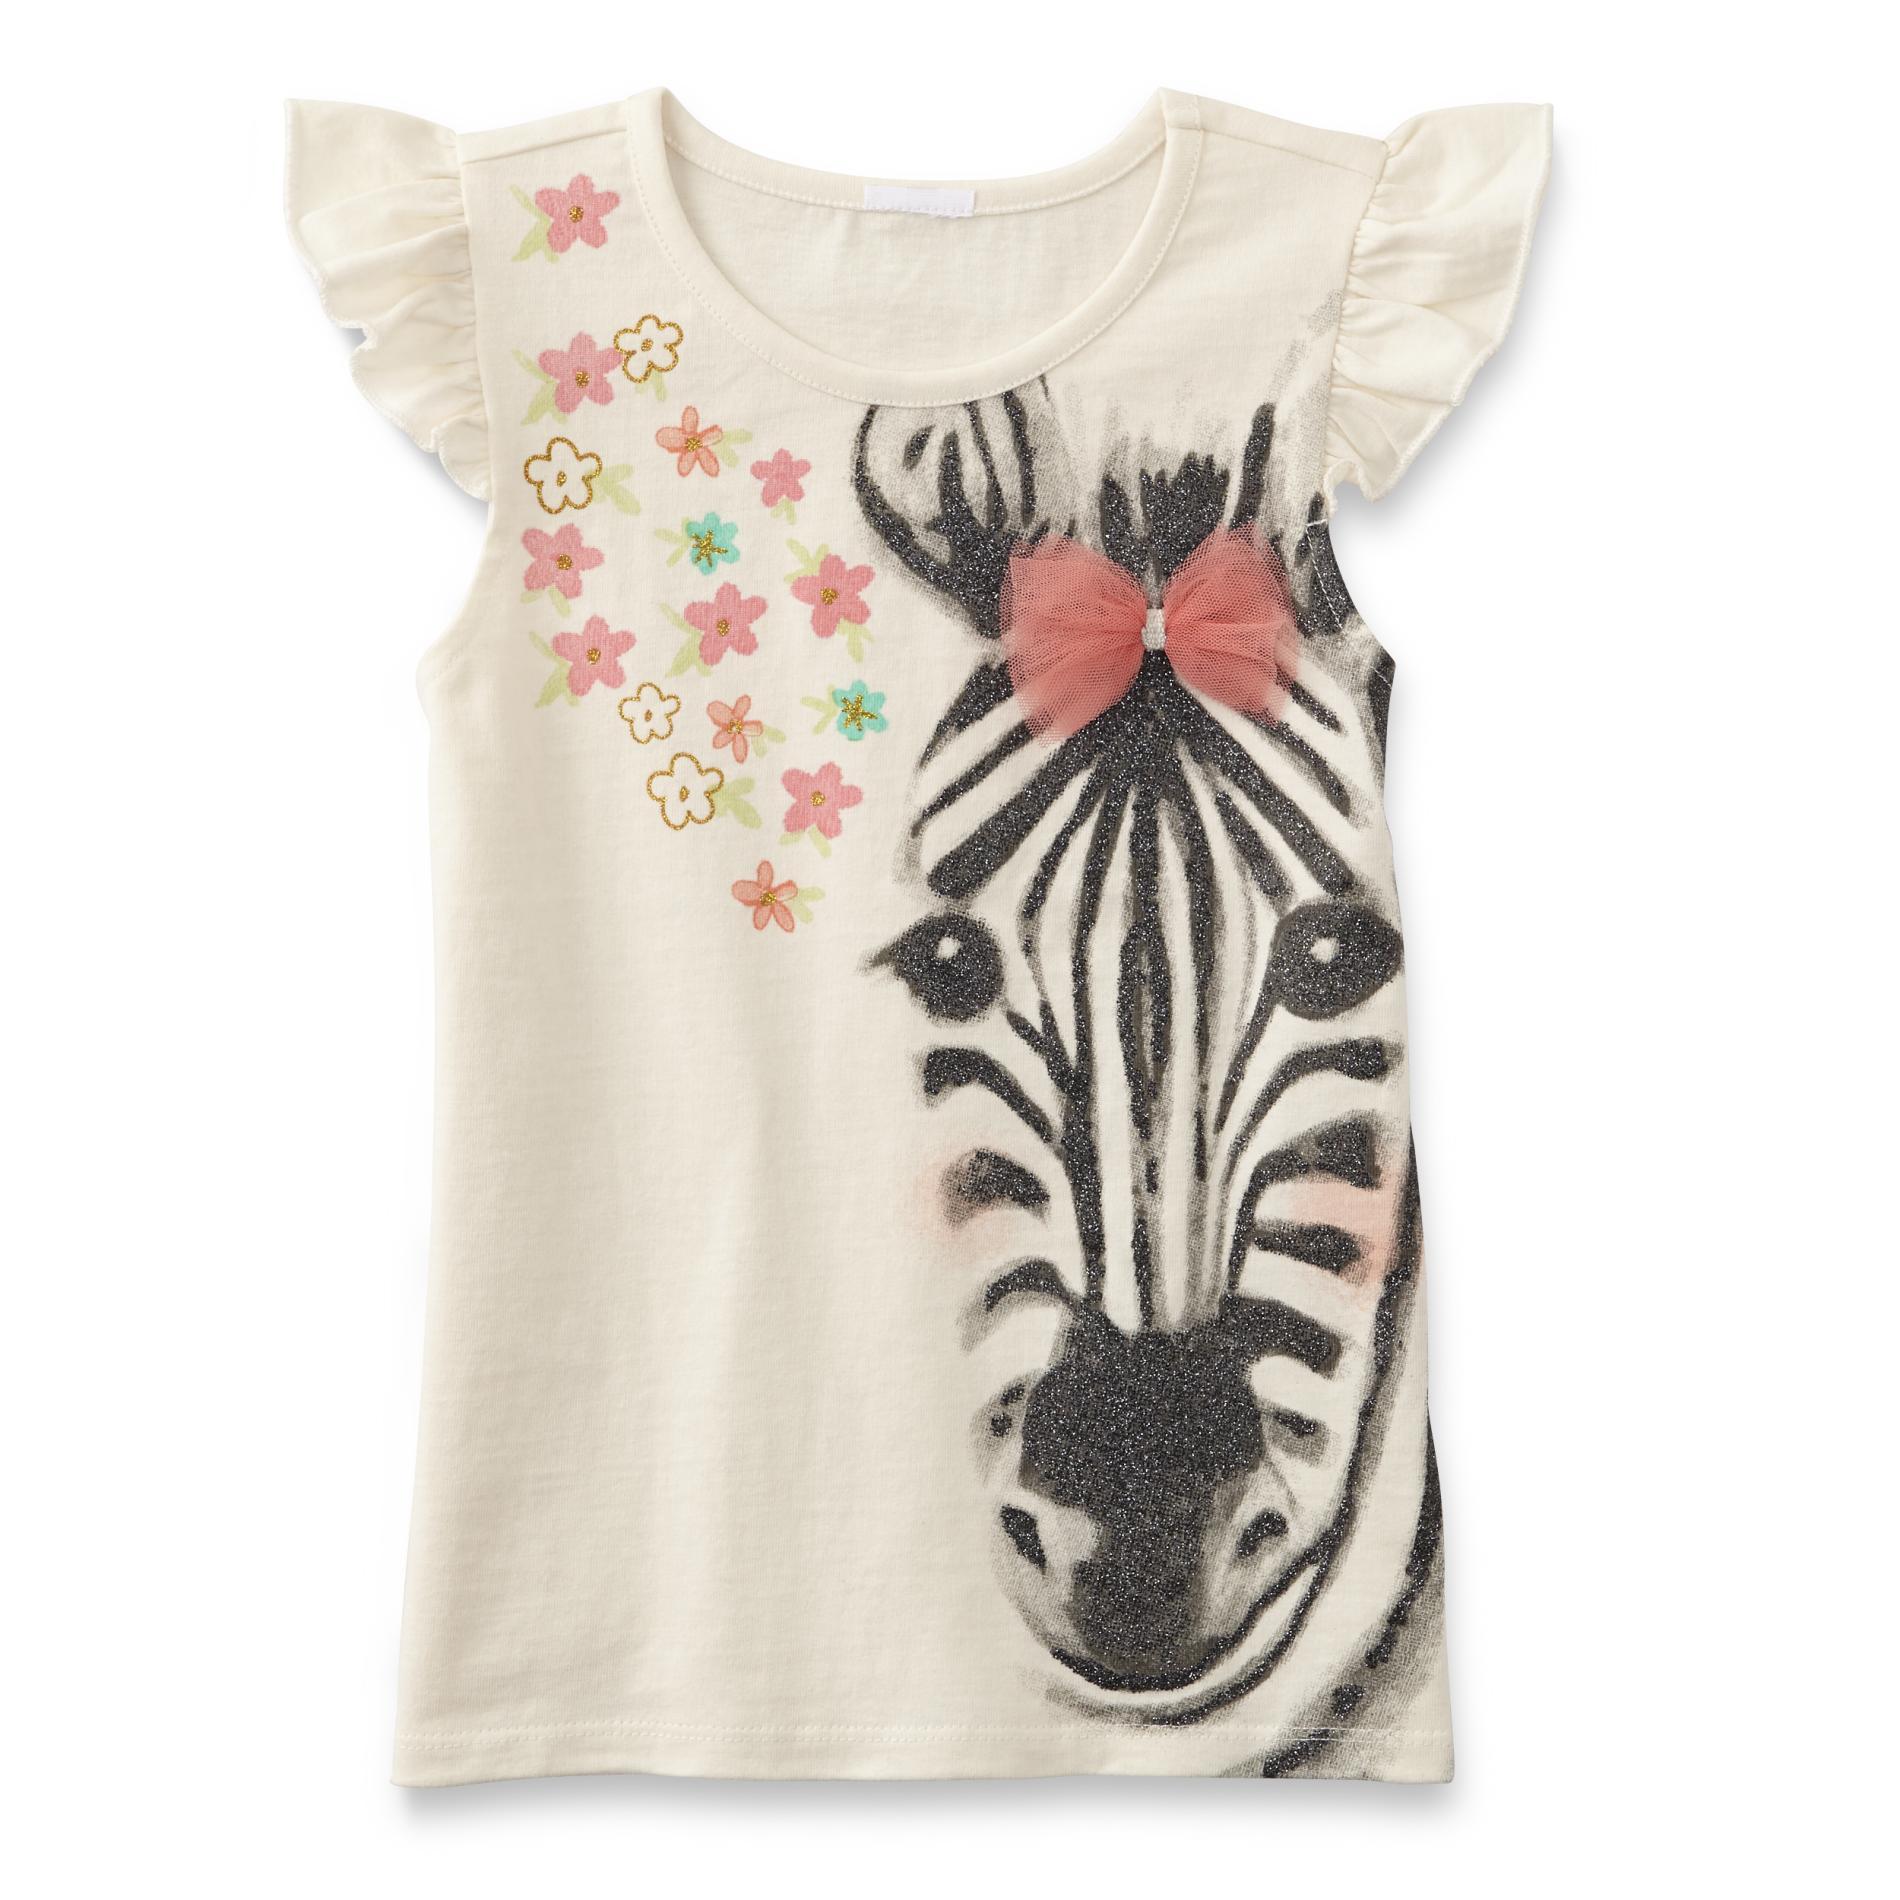 Toughskins Girl's Sleeveless Graphic Shirt - Zebra